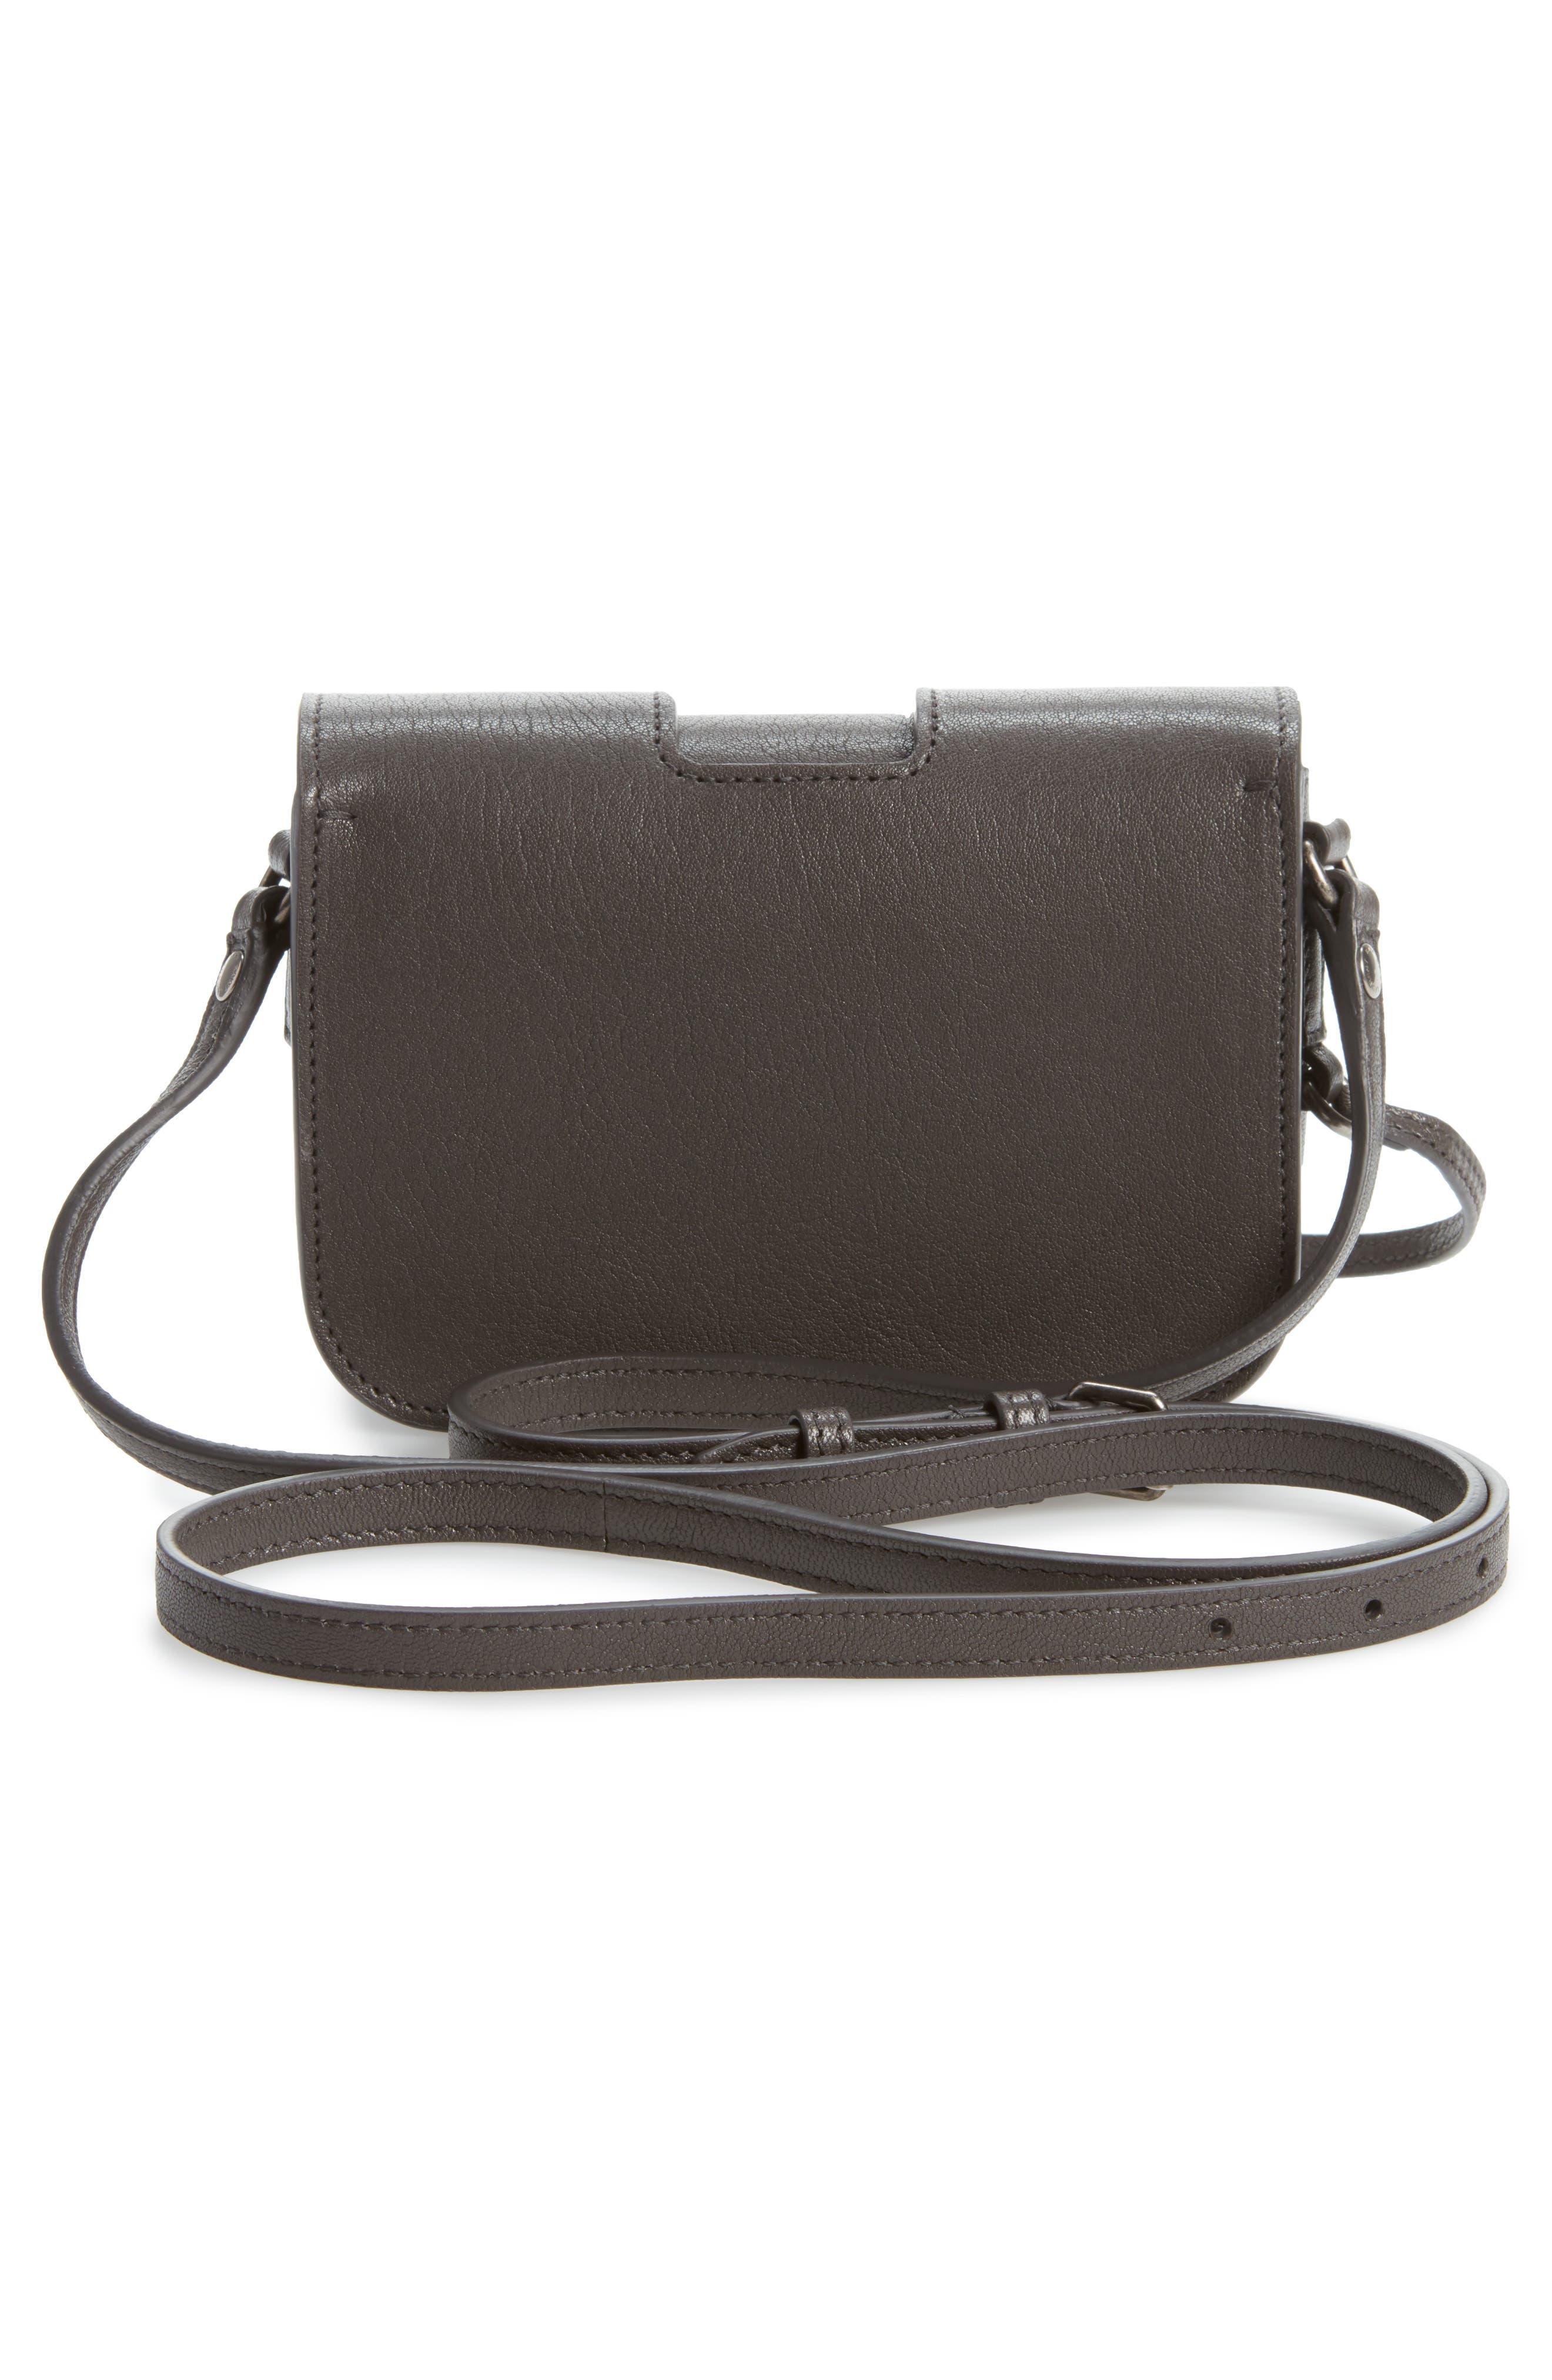 Calfskin Leather Crossbody Bag,                             Alternate thumbnail 4, color,                             Asphalt